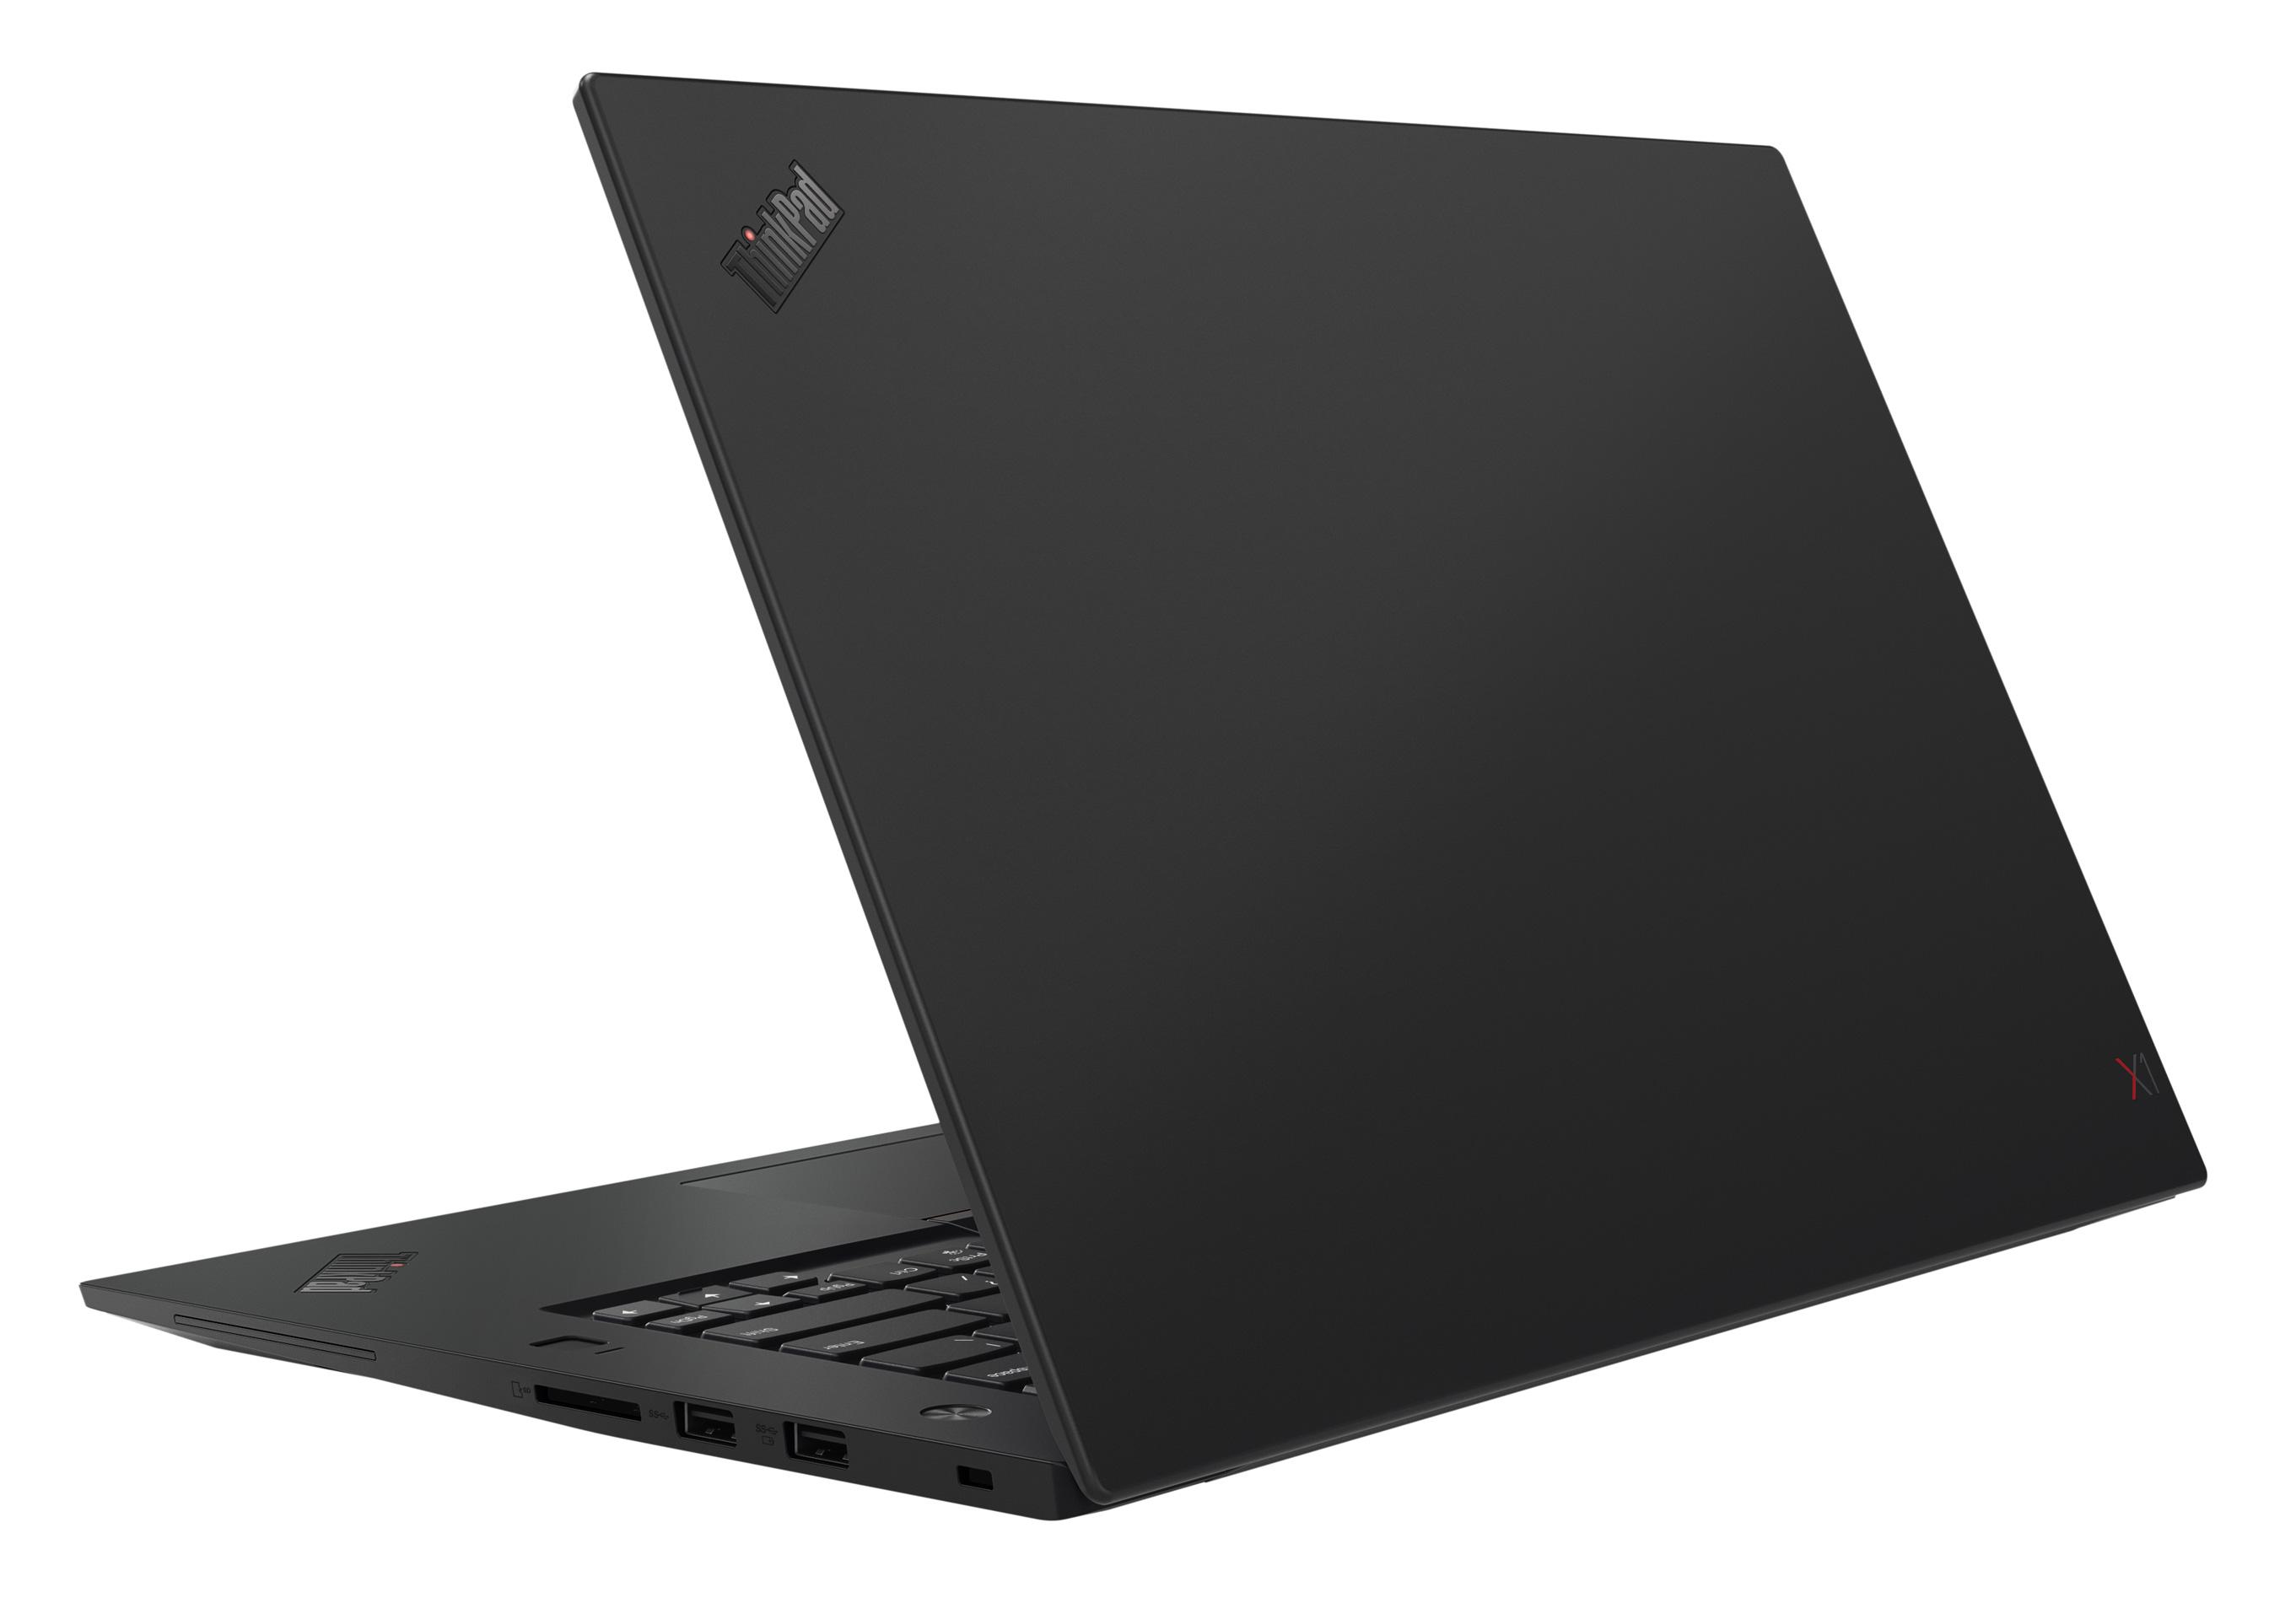 Фото  Ультрабук ThinkPad X1 Extreme 1st Gen (20MF000VRT)